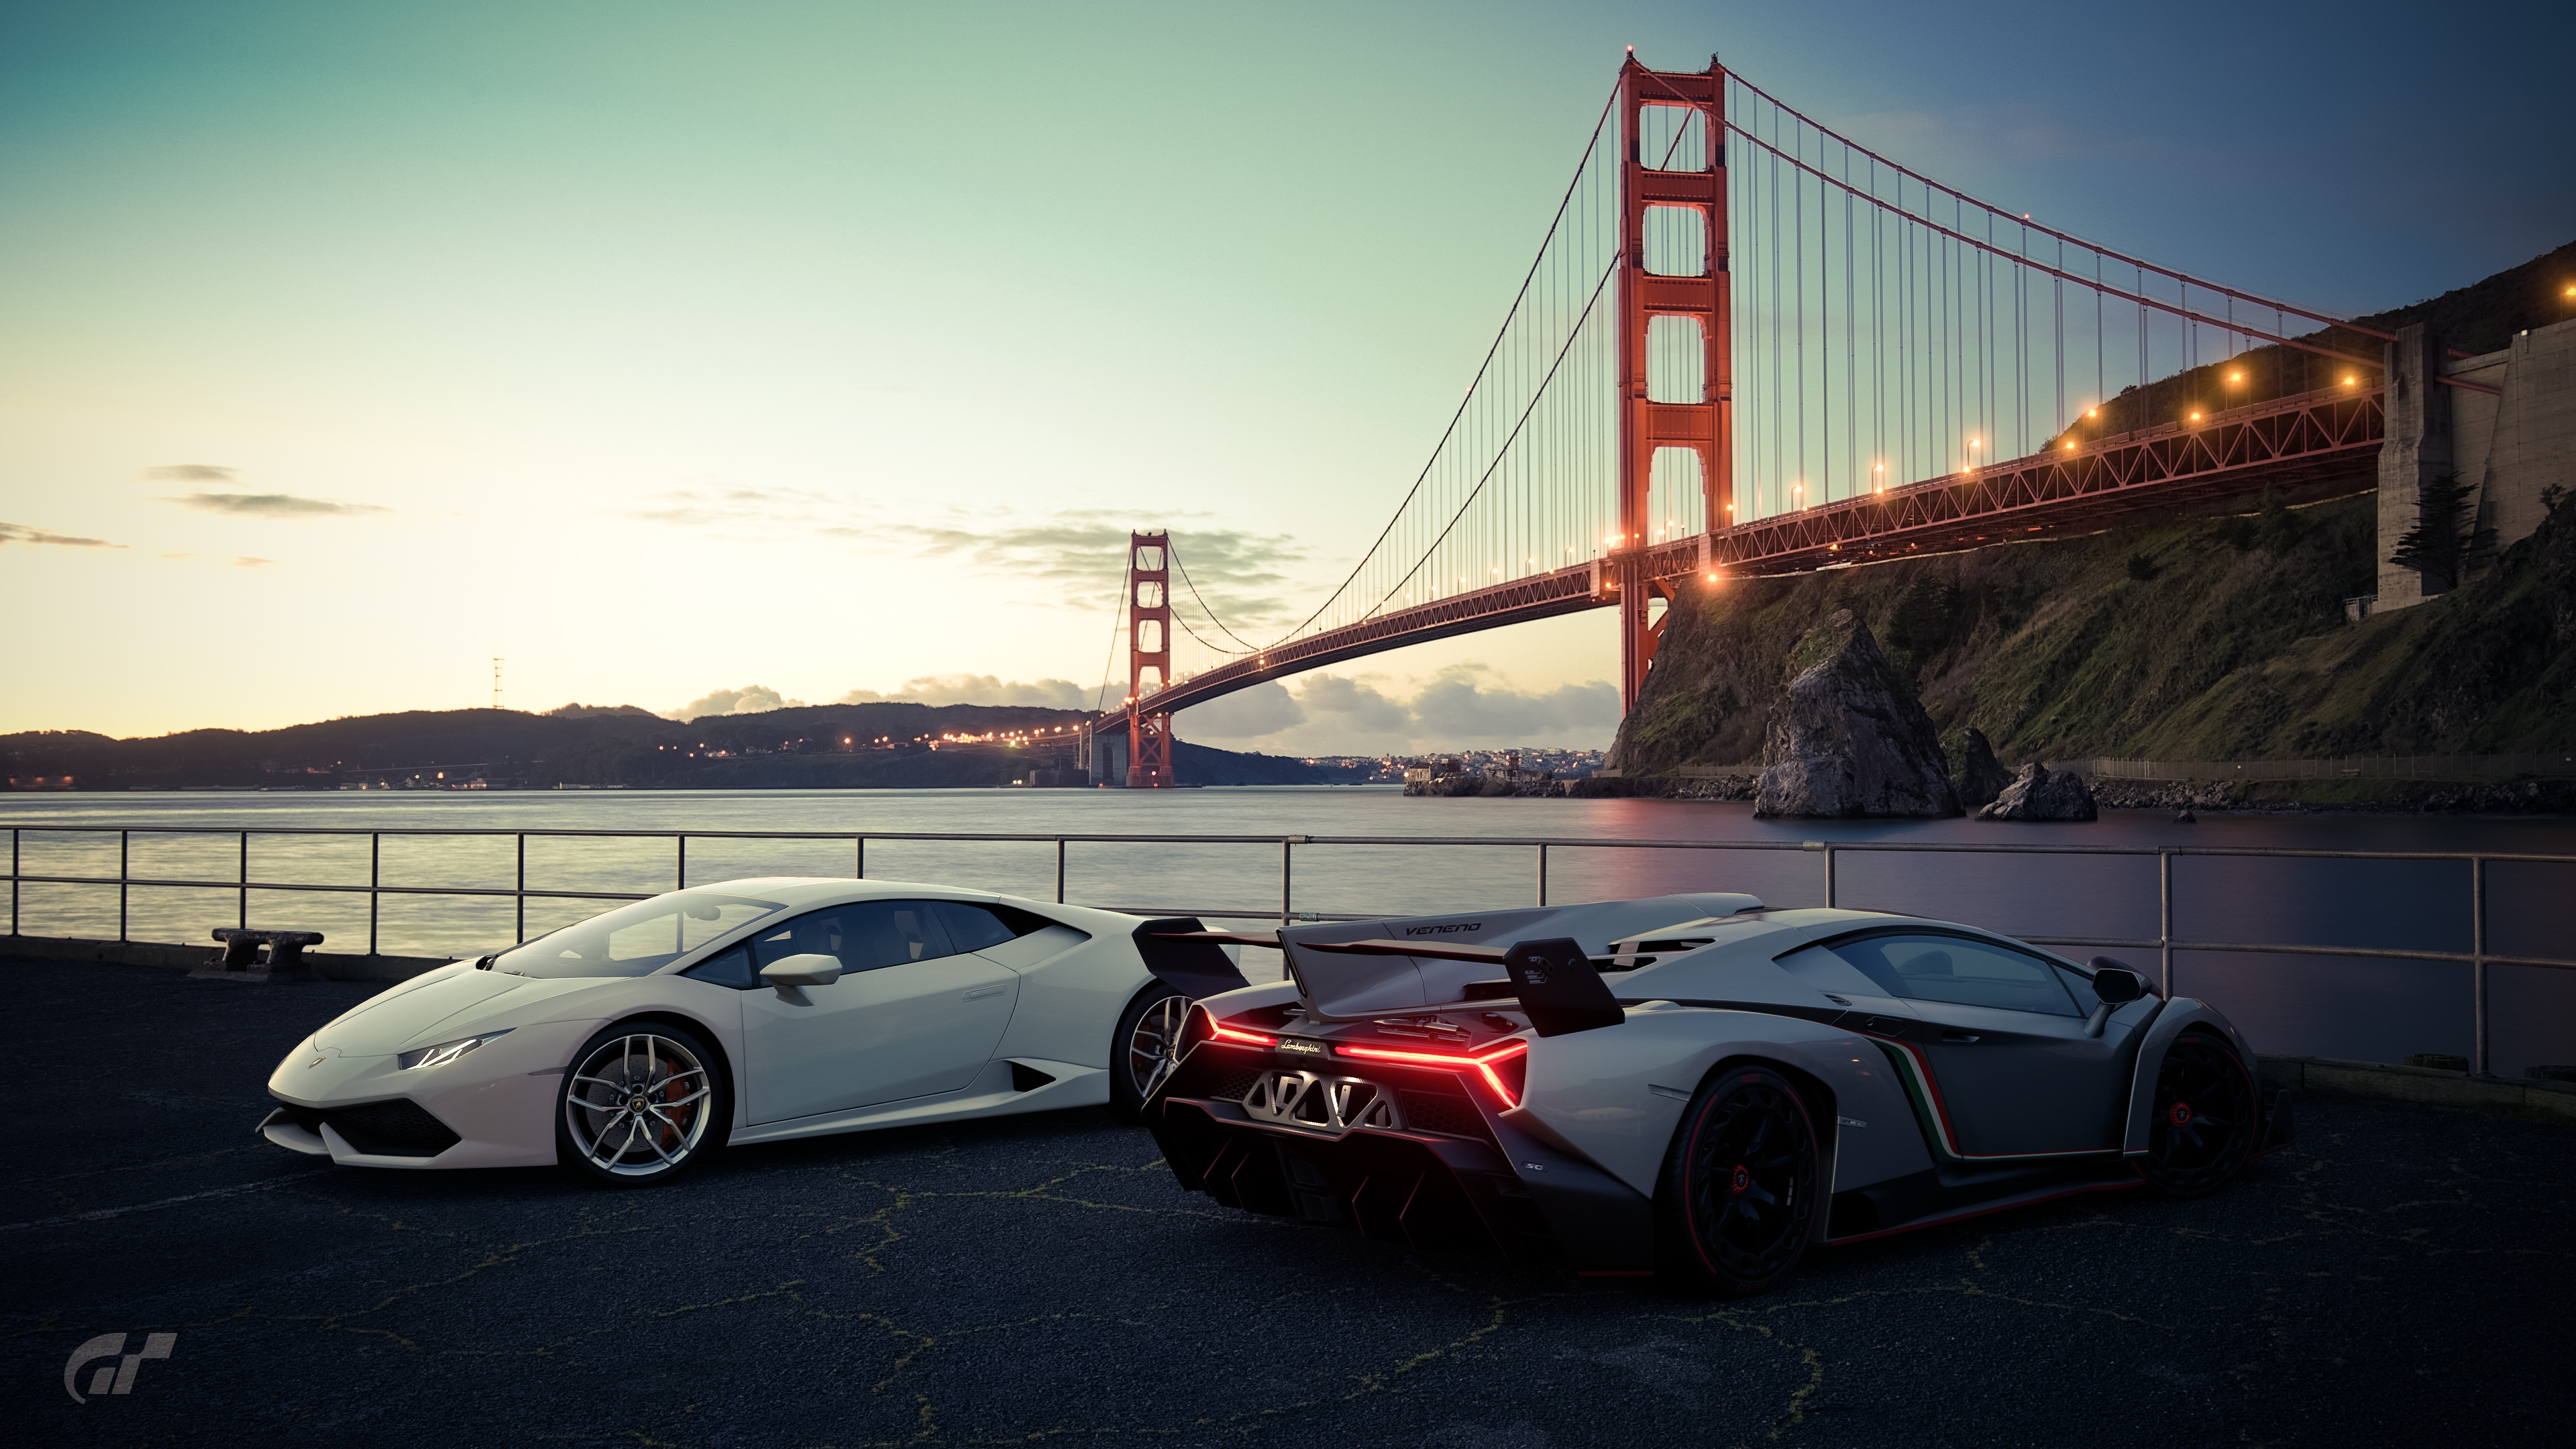 1366x768 Lamborghini Huracan Veneno Gran Turismo 1366x768